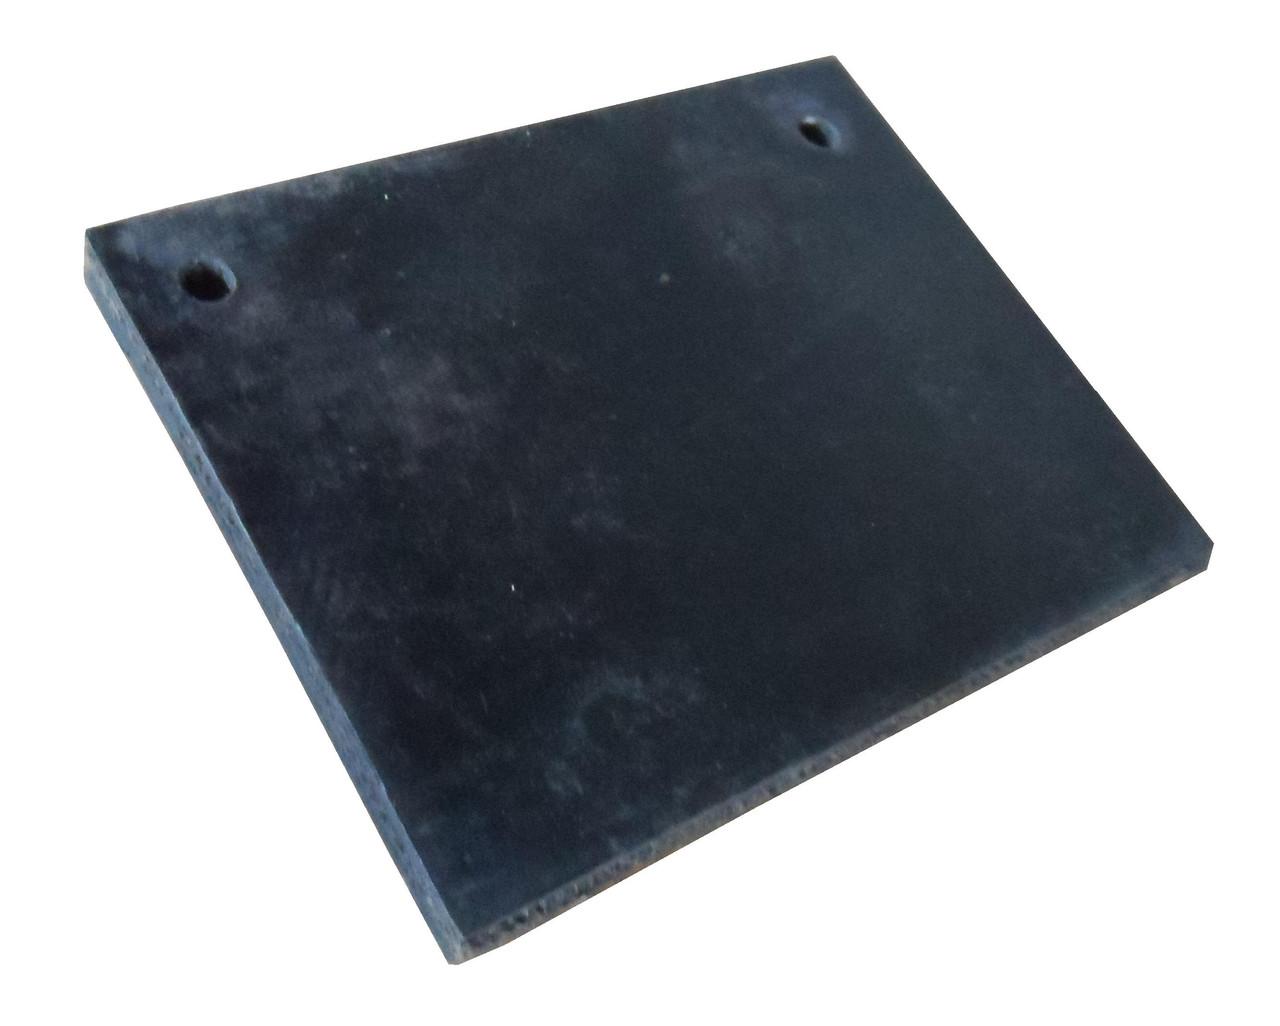 Лопатка широкая БЦС (130/100мм)